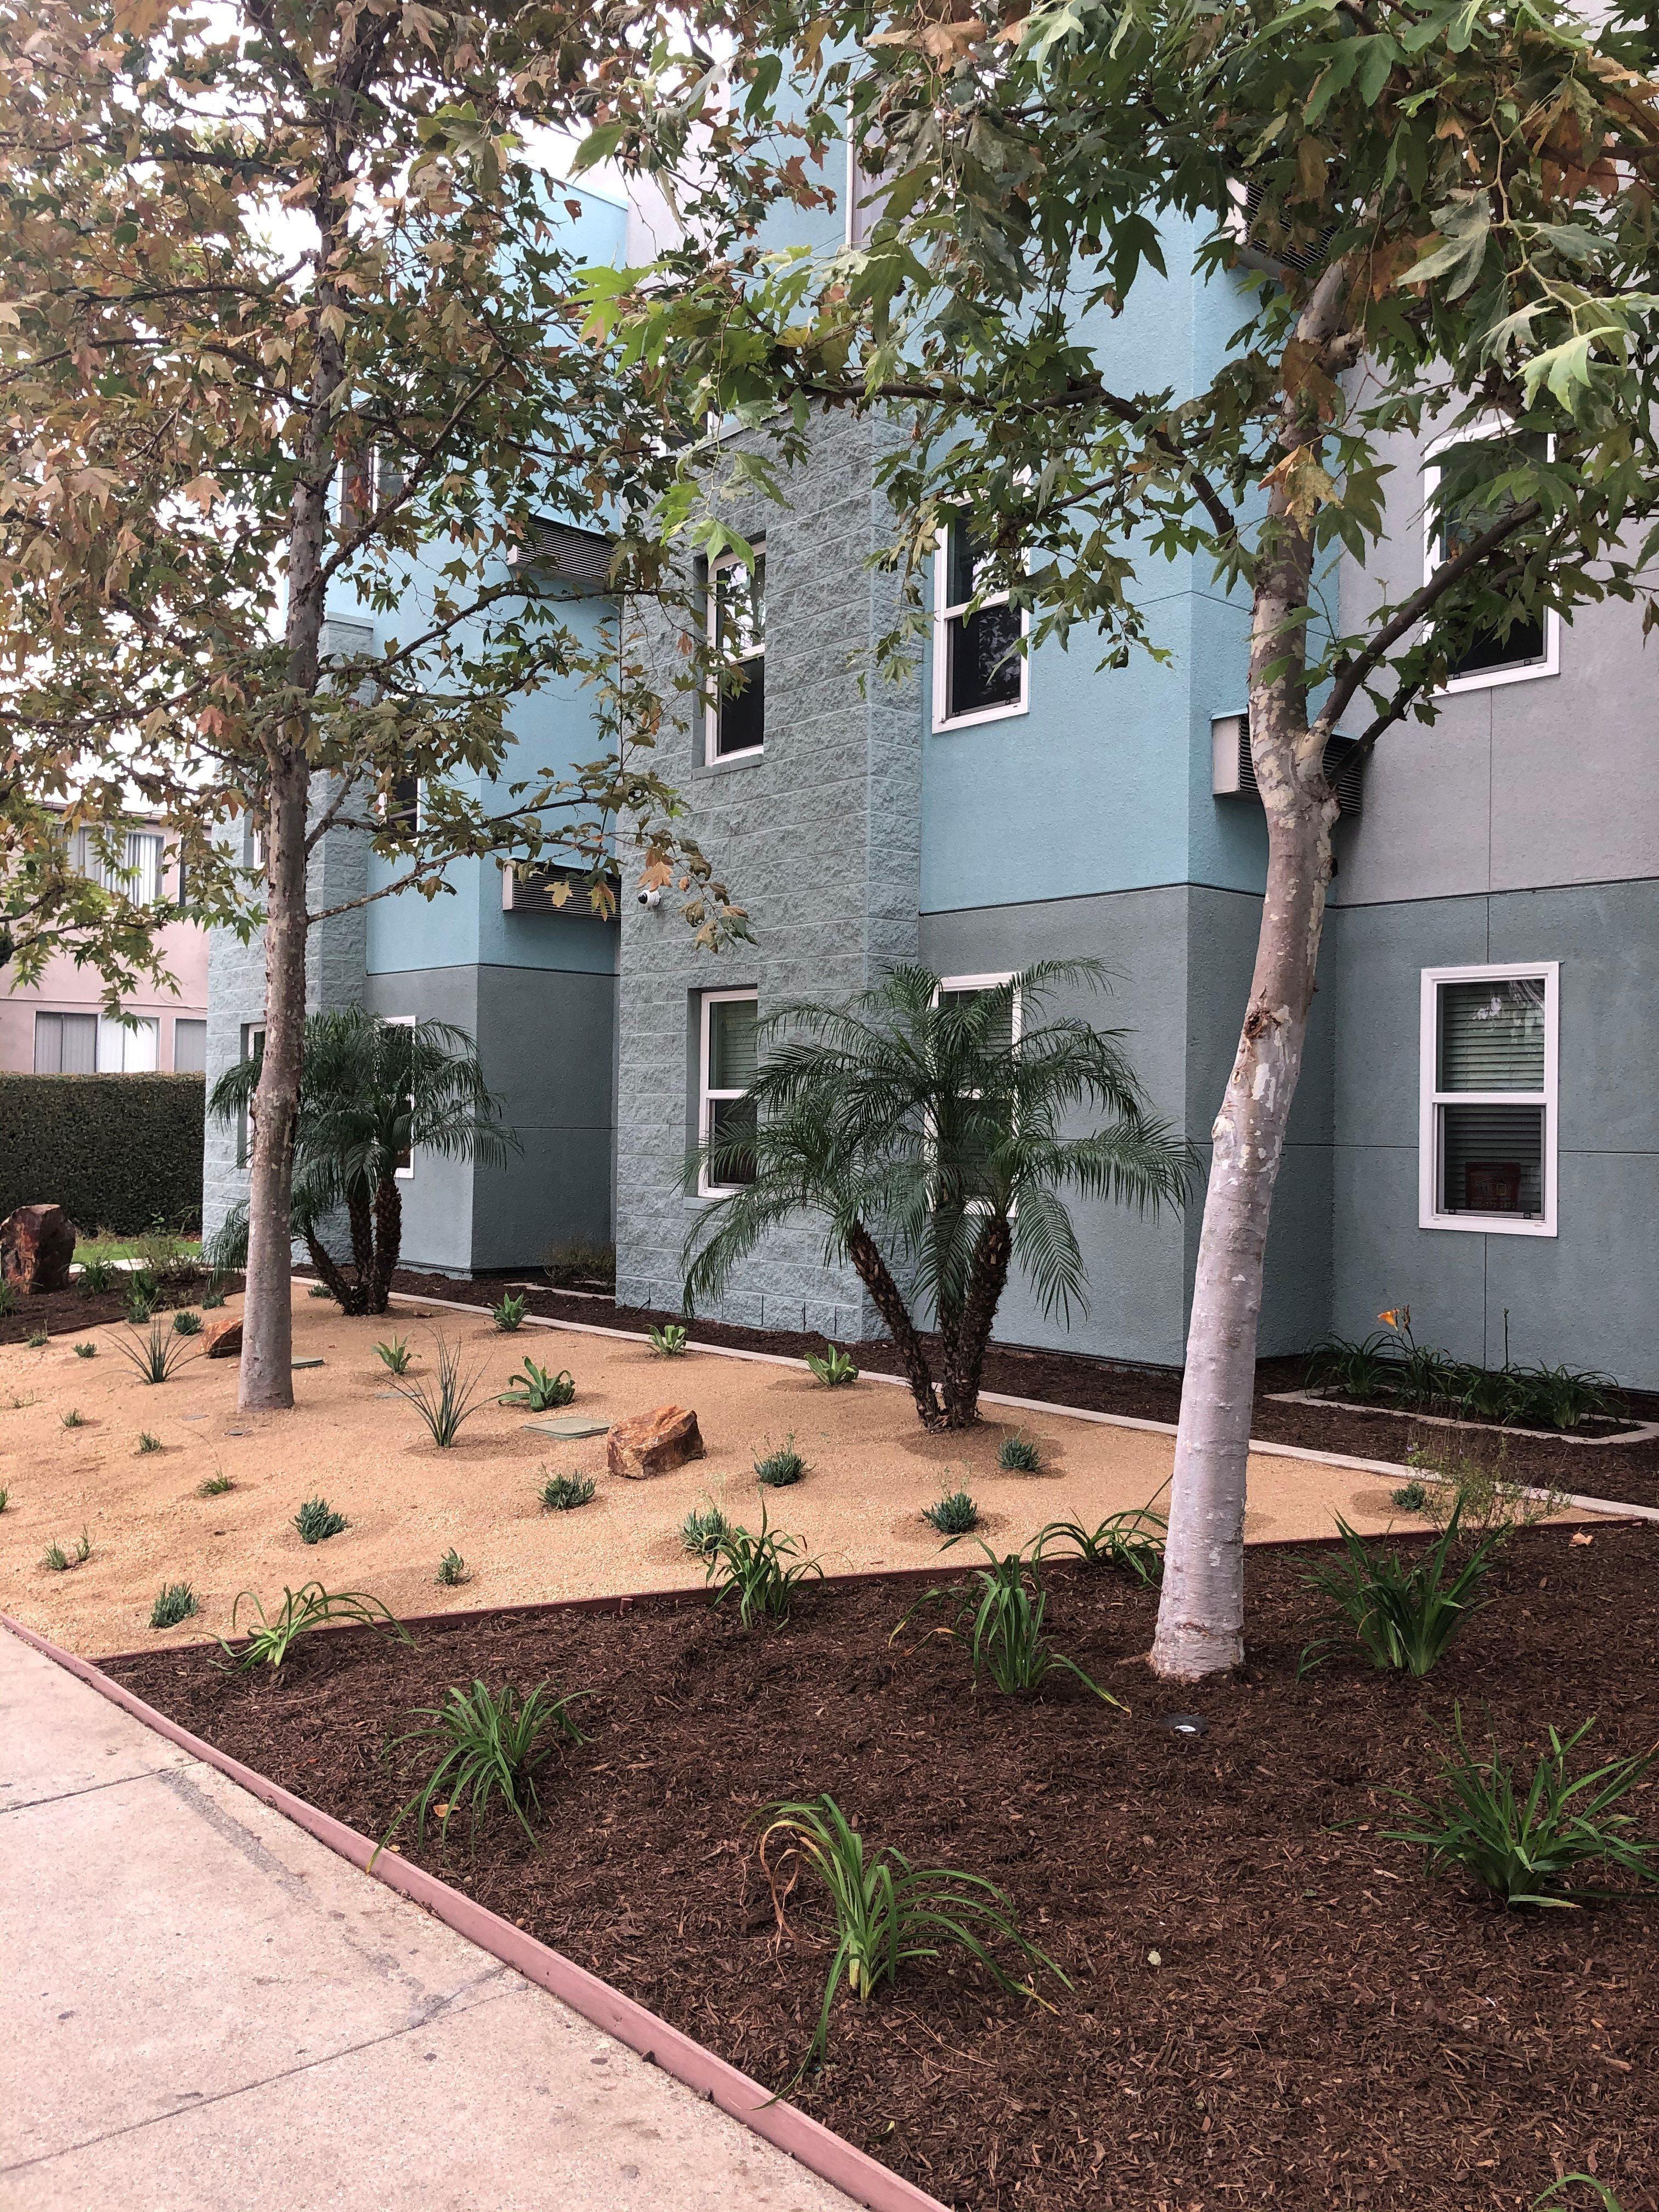 New landscape at Castlewood Terrace